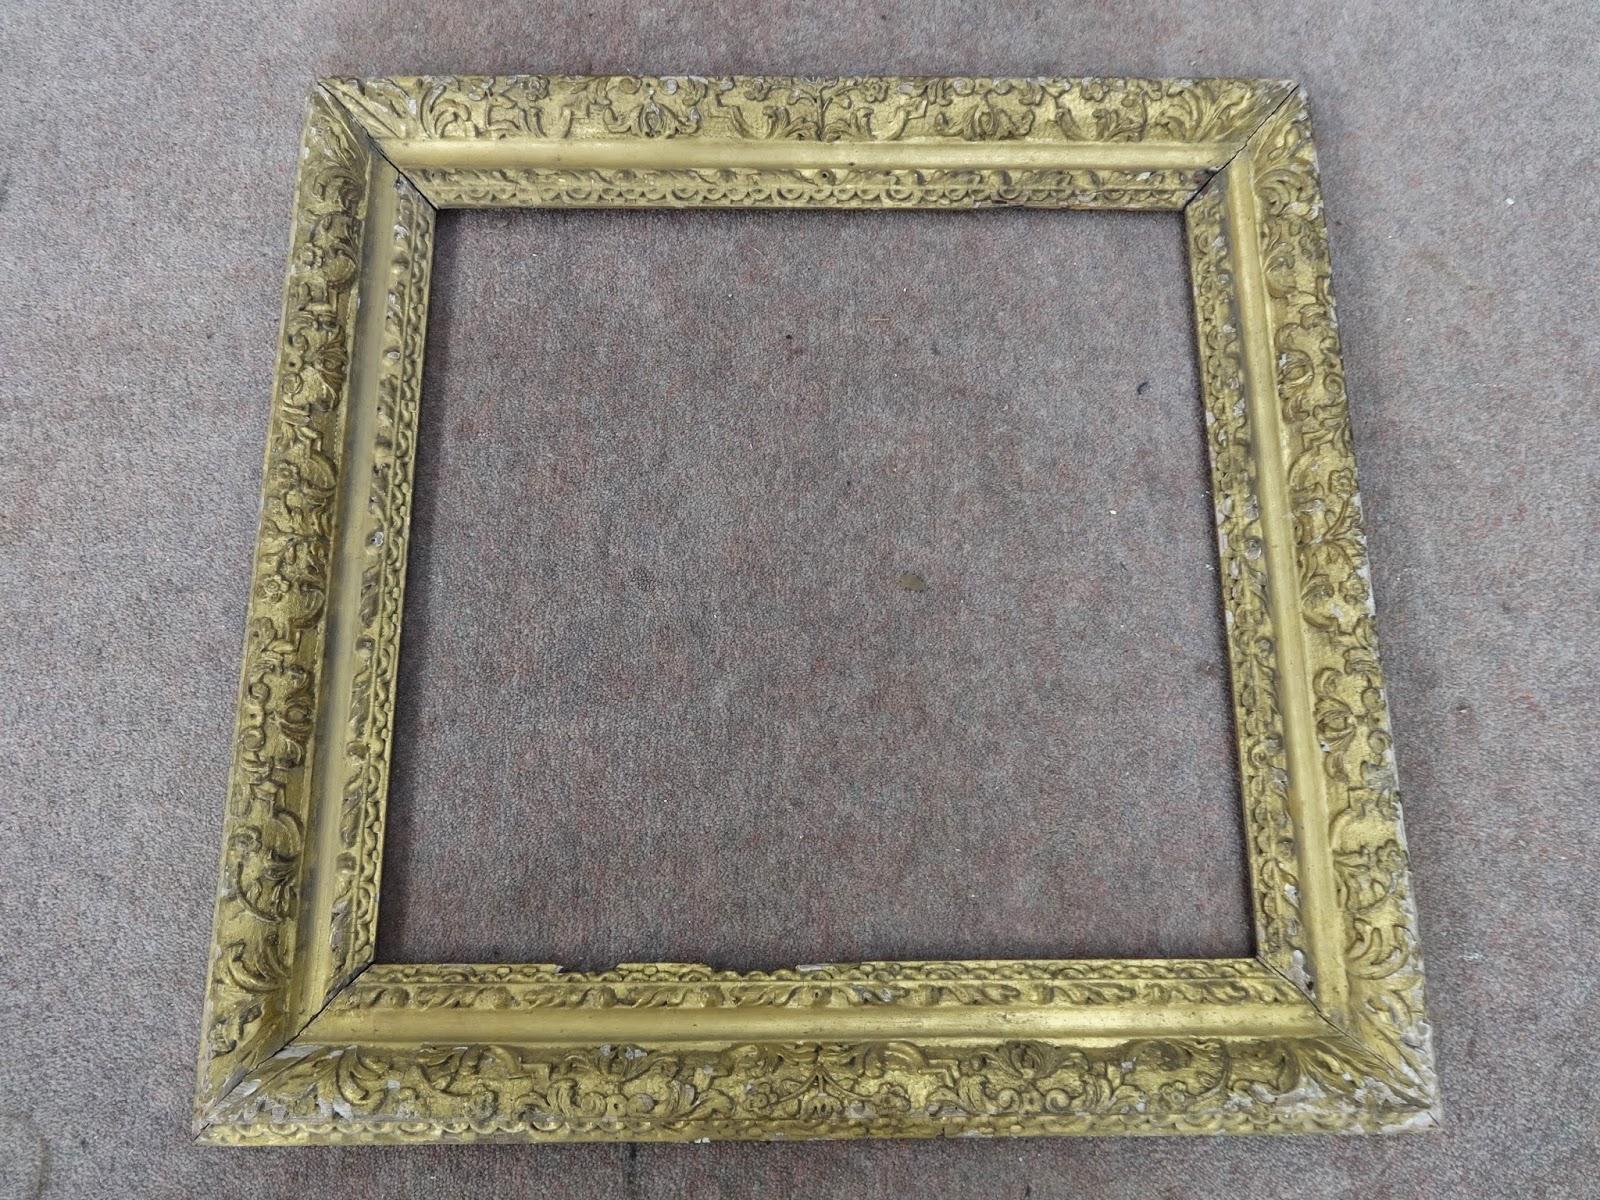 Framemaker: An English 17th/18th C Carved Frame